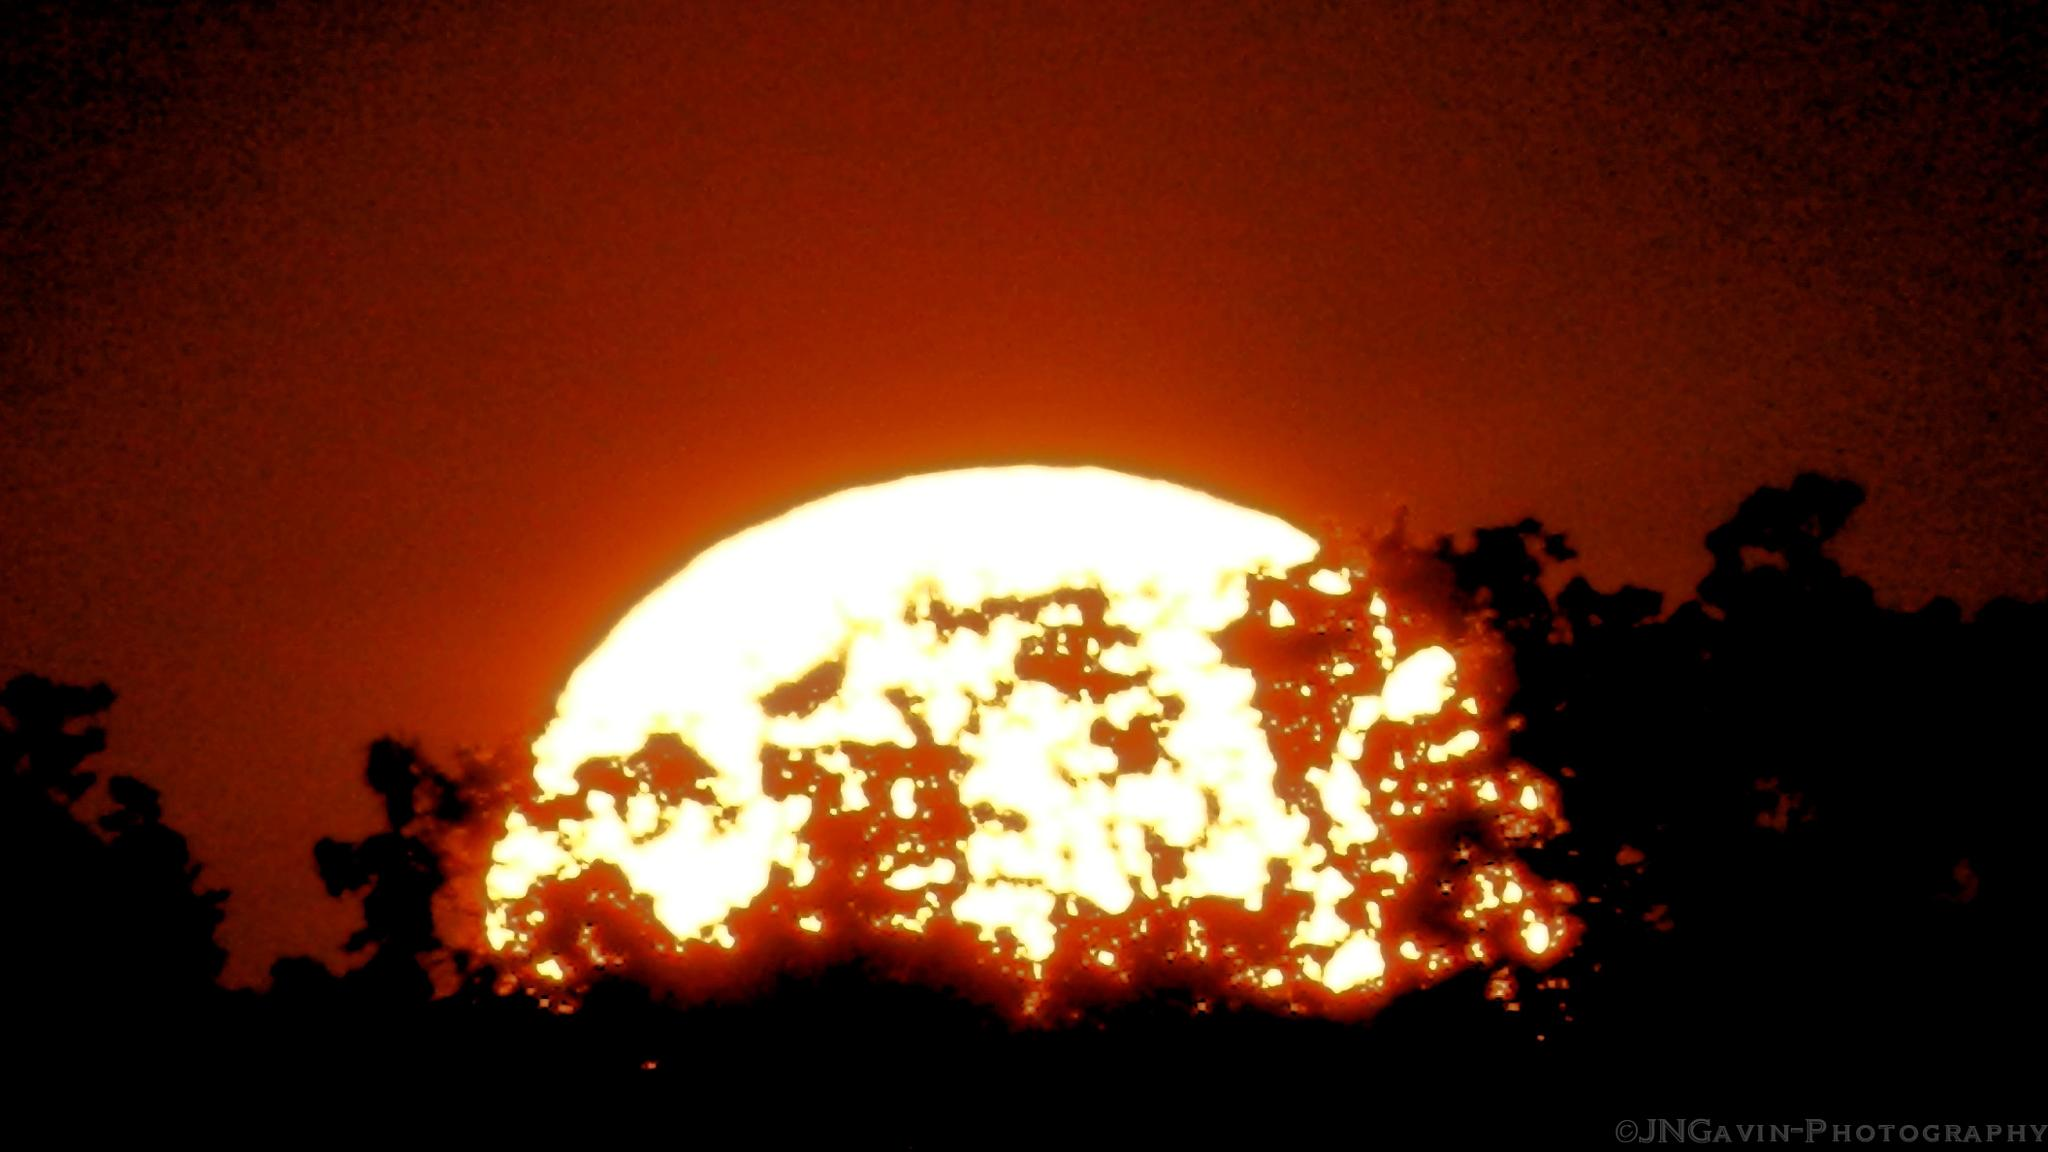 Fireball by John Gavin